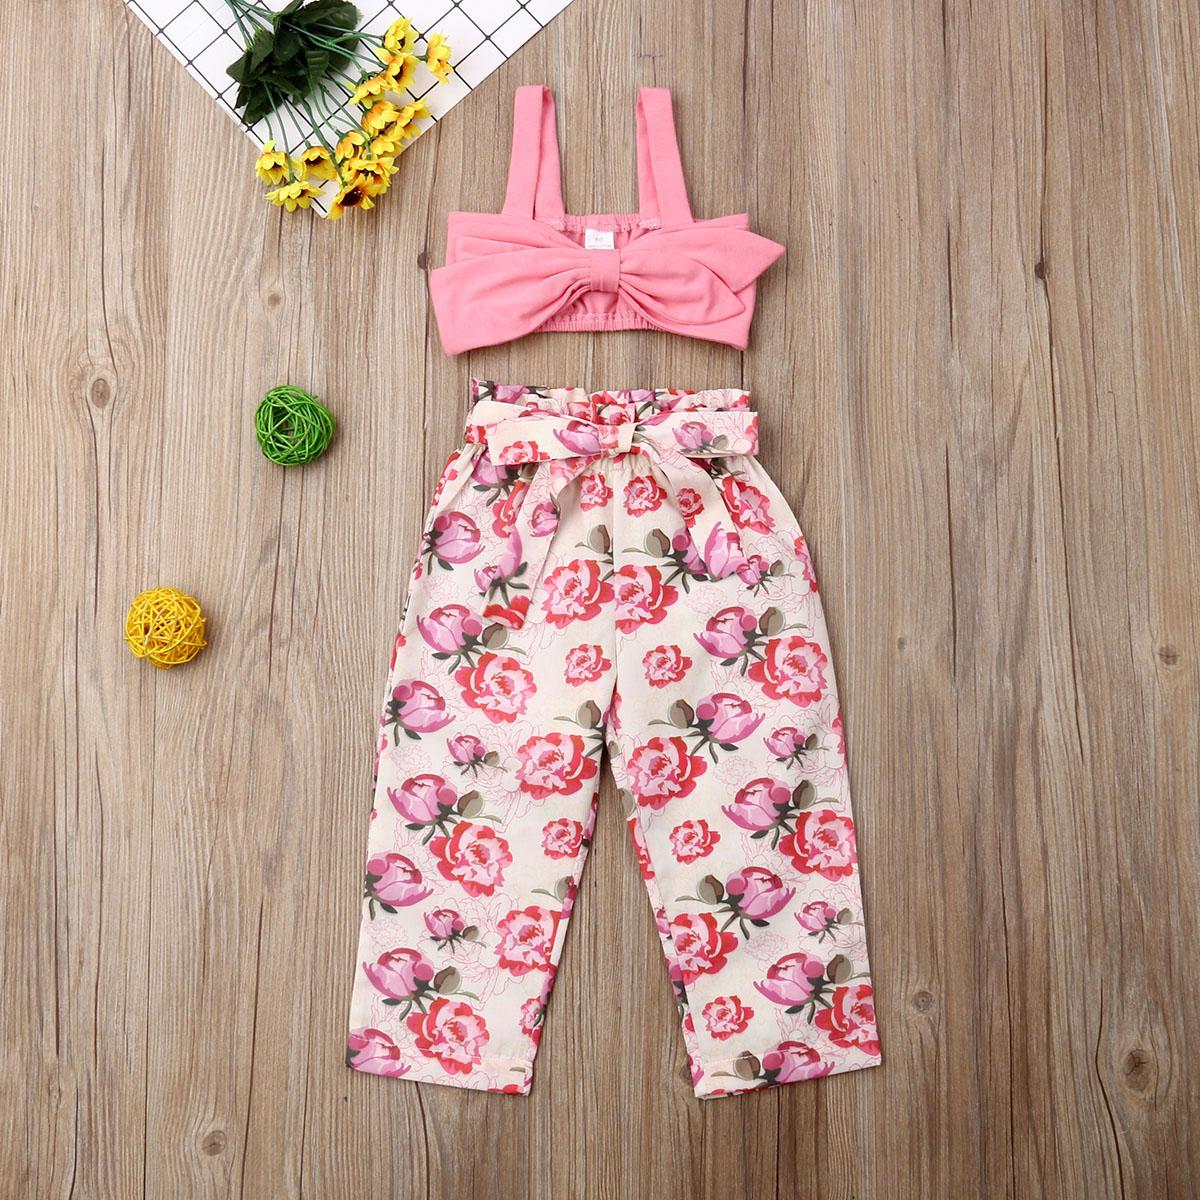 Pudcoco Toddler Baby Girl Clothes Solid Color Crop Vest Strap Tops Flower Print Long Pants 2Pcs Outfits Cotton Clothes